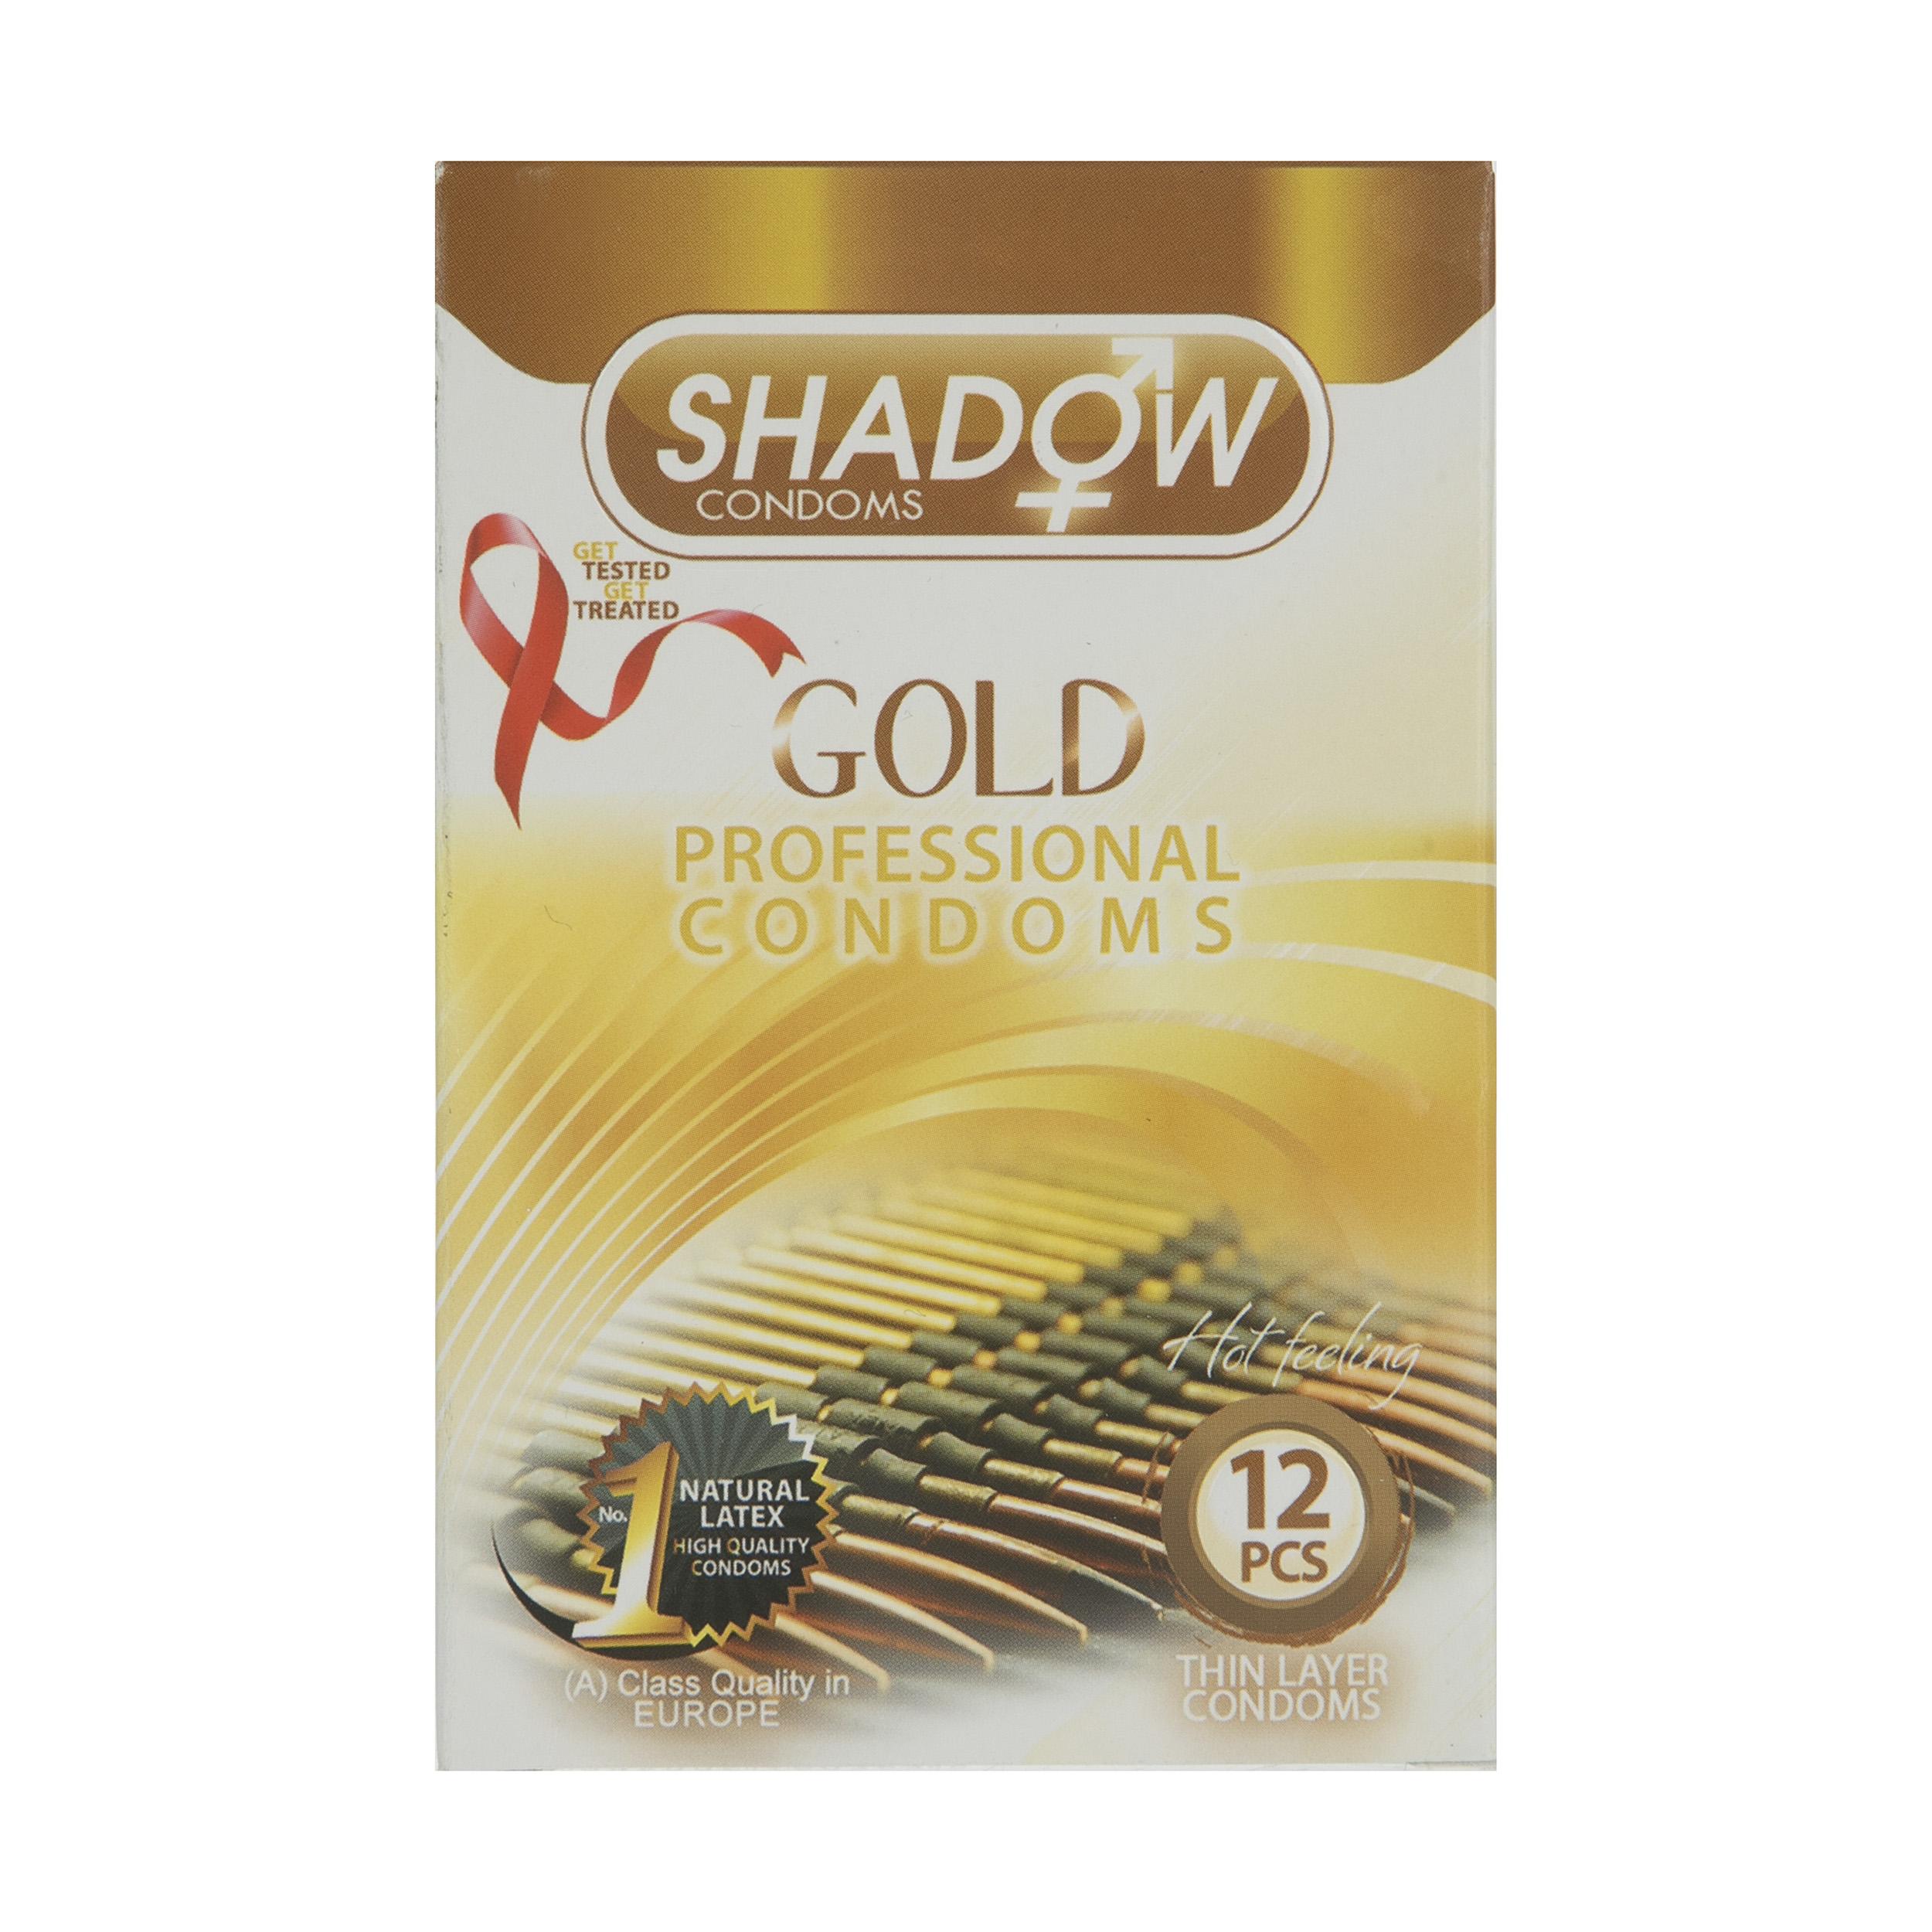 کاندوم شادو مدل Gold بسته 12 عددی